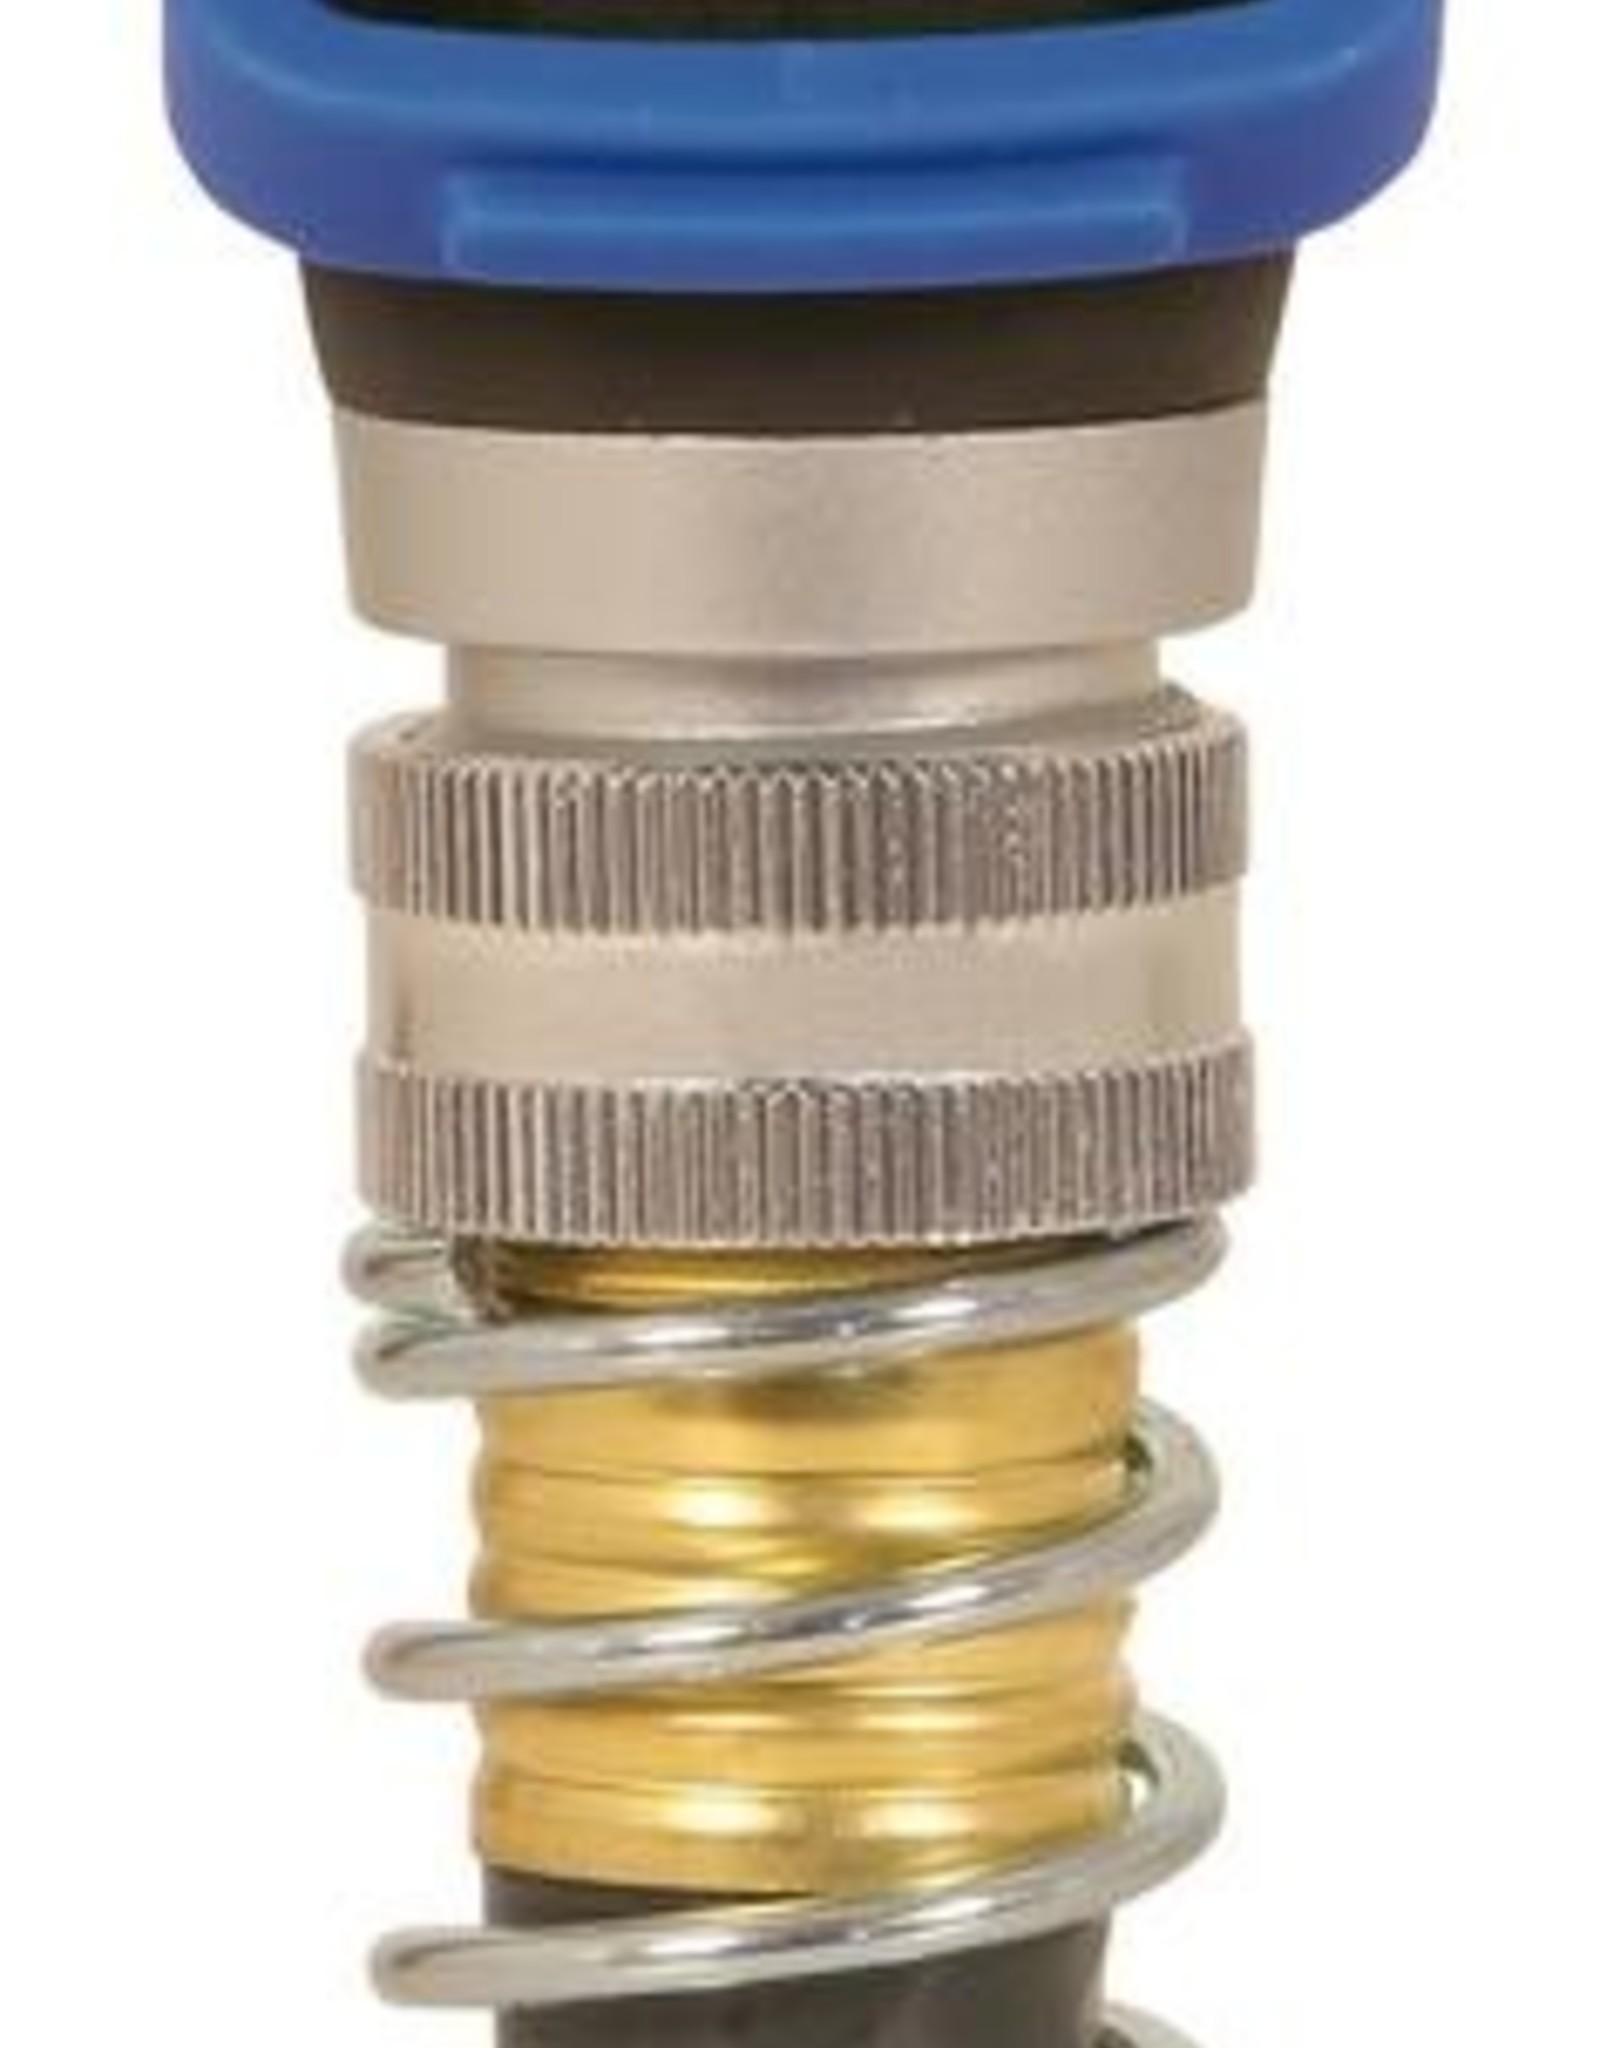 Rainmaker® Rainmaker Kink Free High Flow Single Hose Adapter Outlet